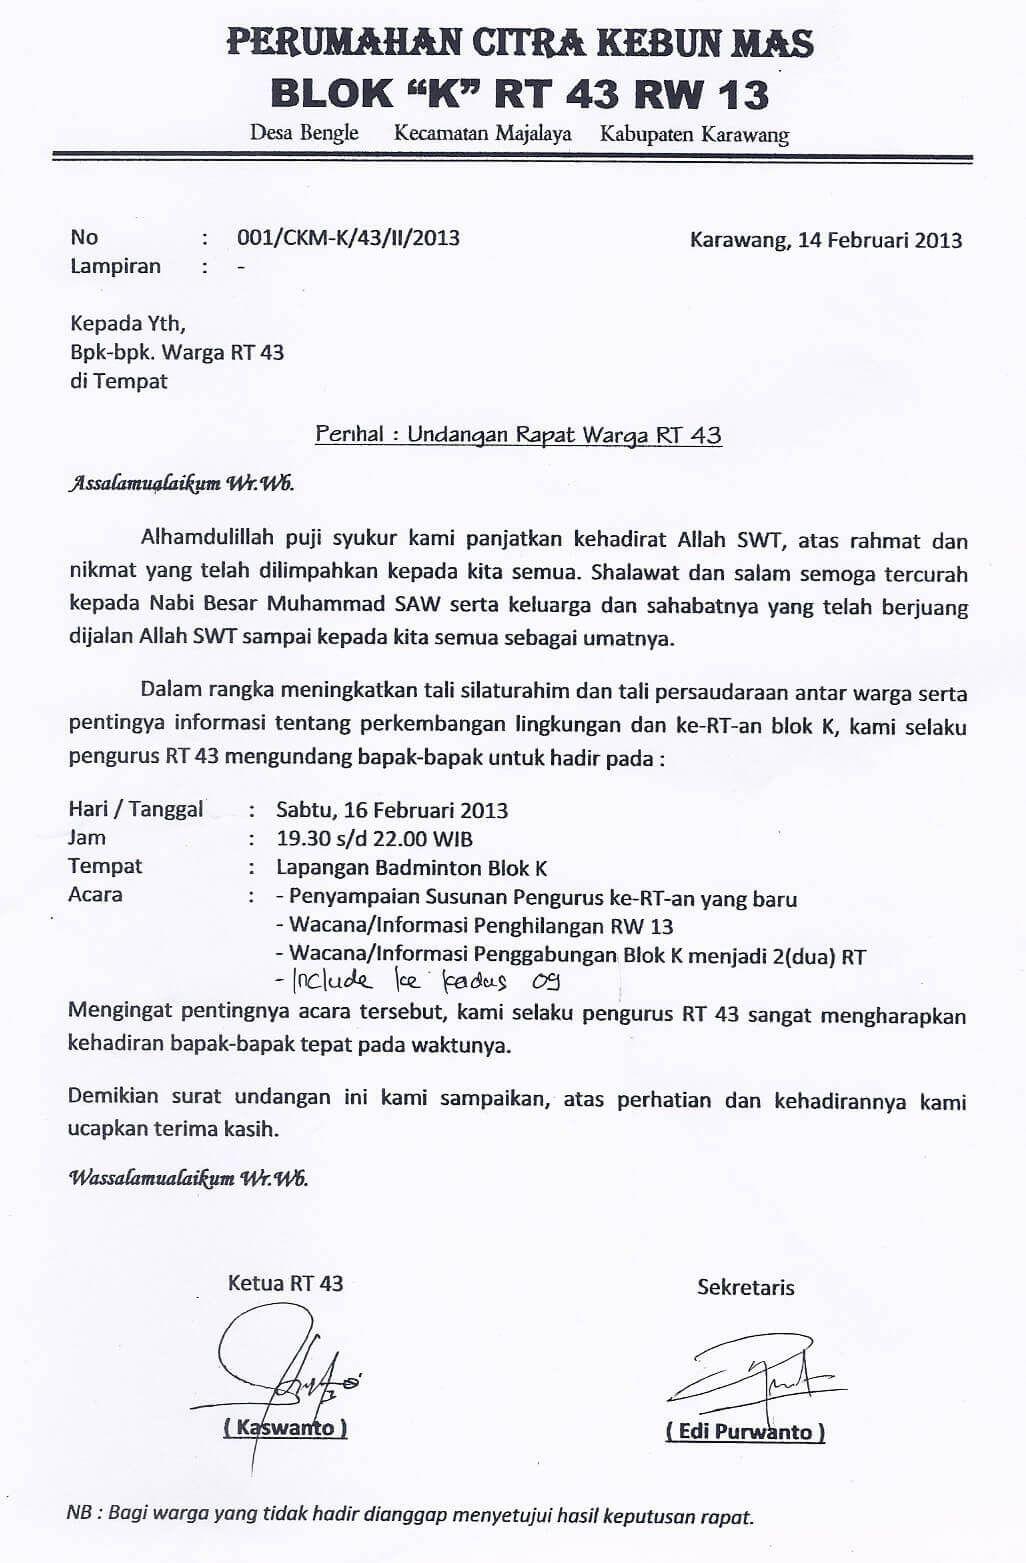 Contoh Surat Undangan Rapat Resmi Organisasi Undangan Kata Kata Motivasi Surat